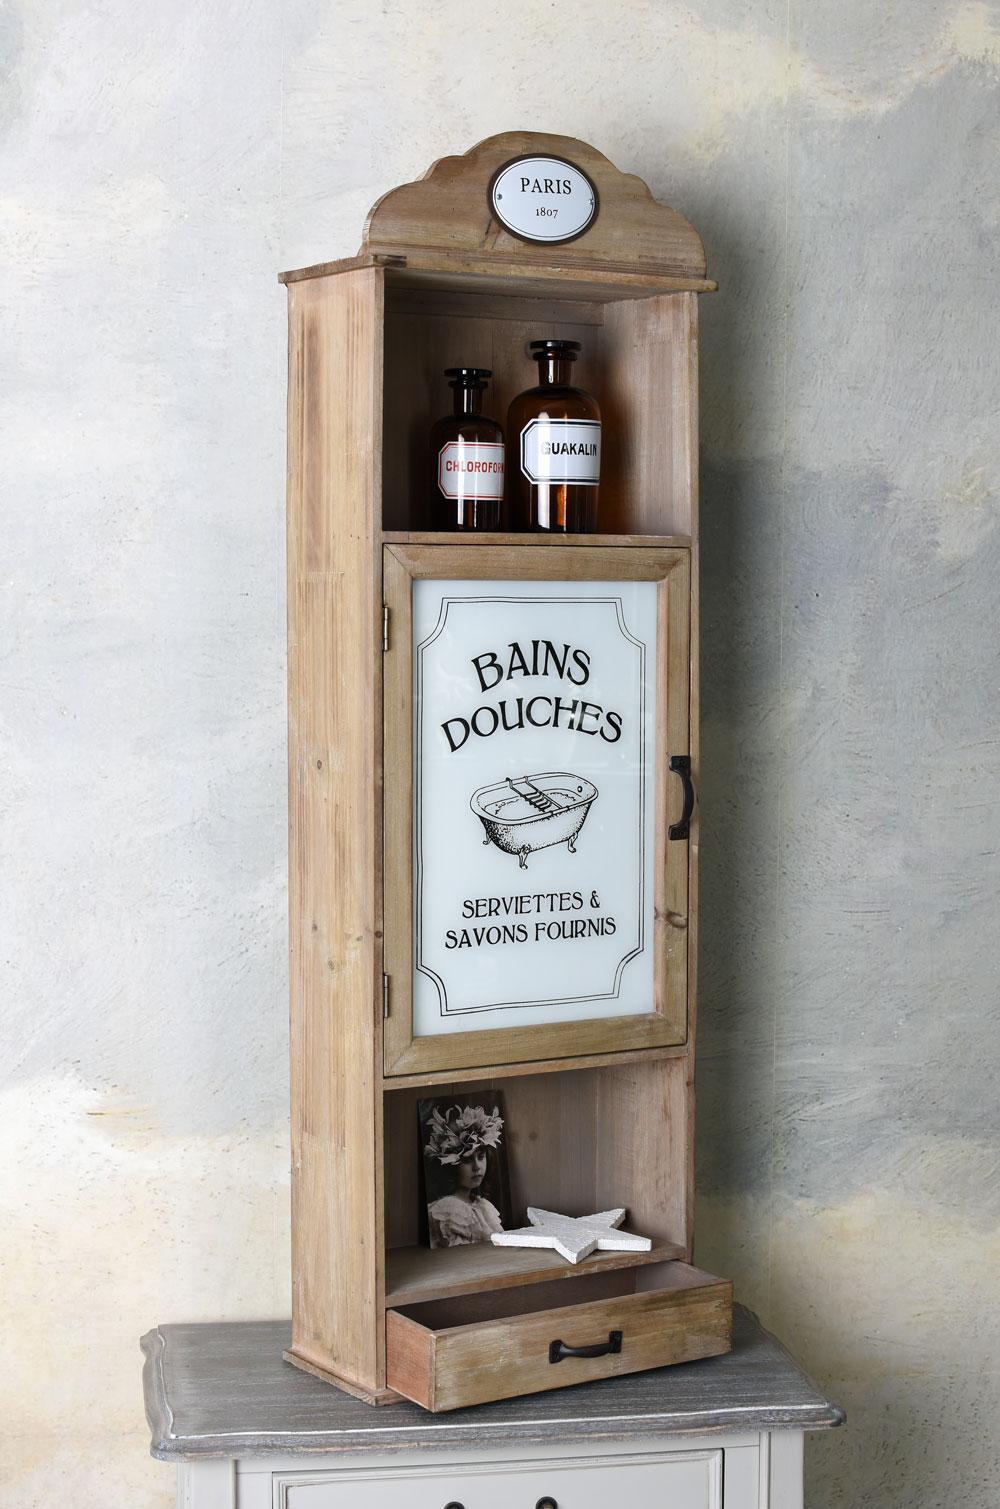 Französischer Badschrank Bad Hängeschrank Wandregal Medizinschrank Wandschrank